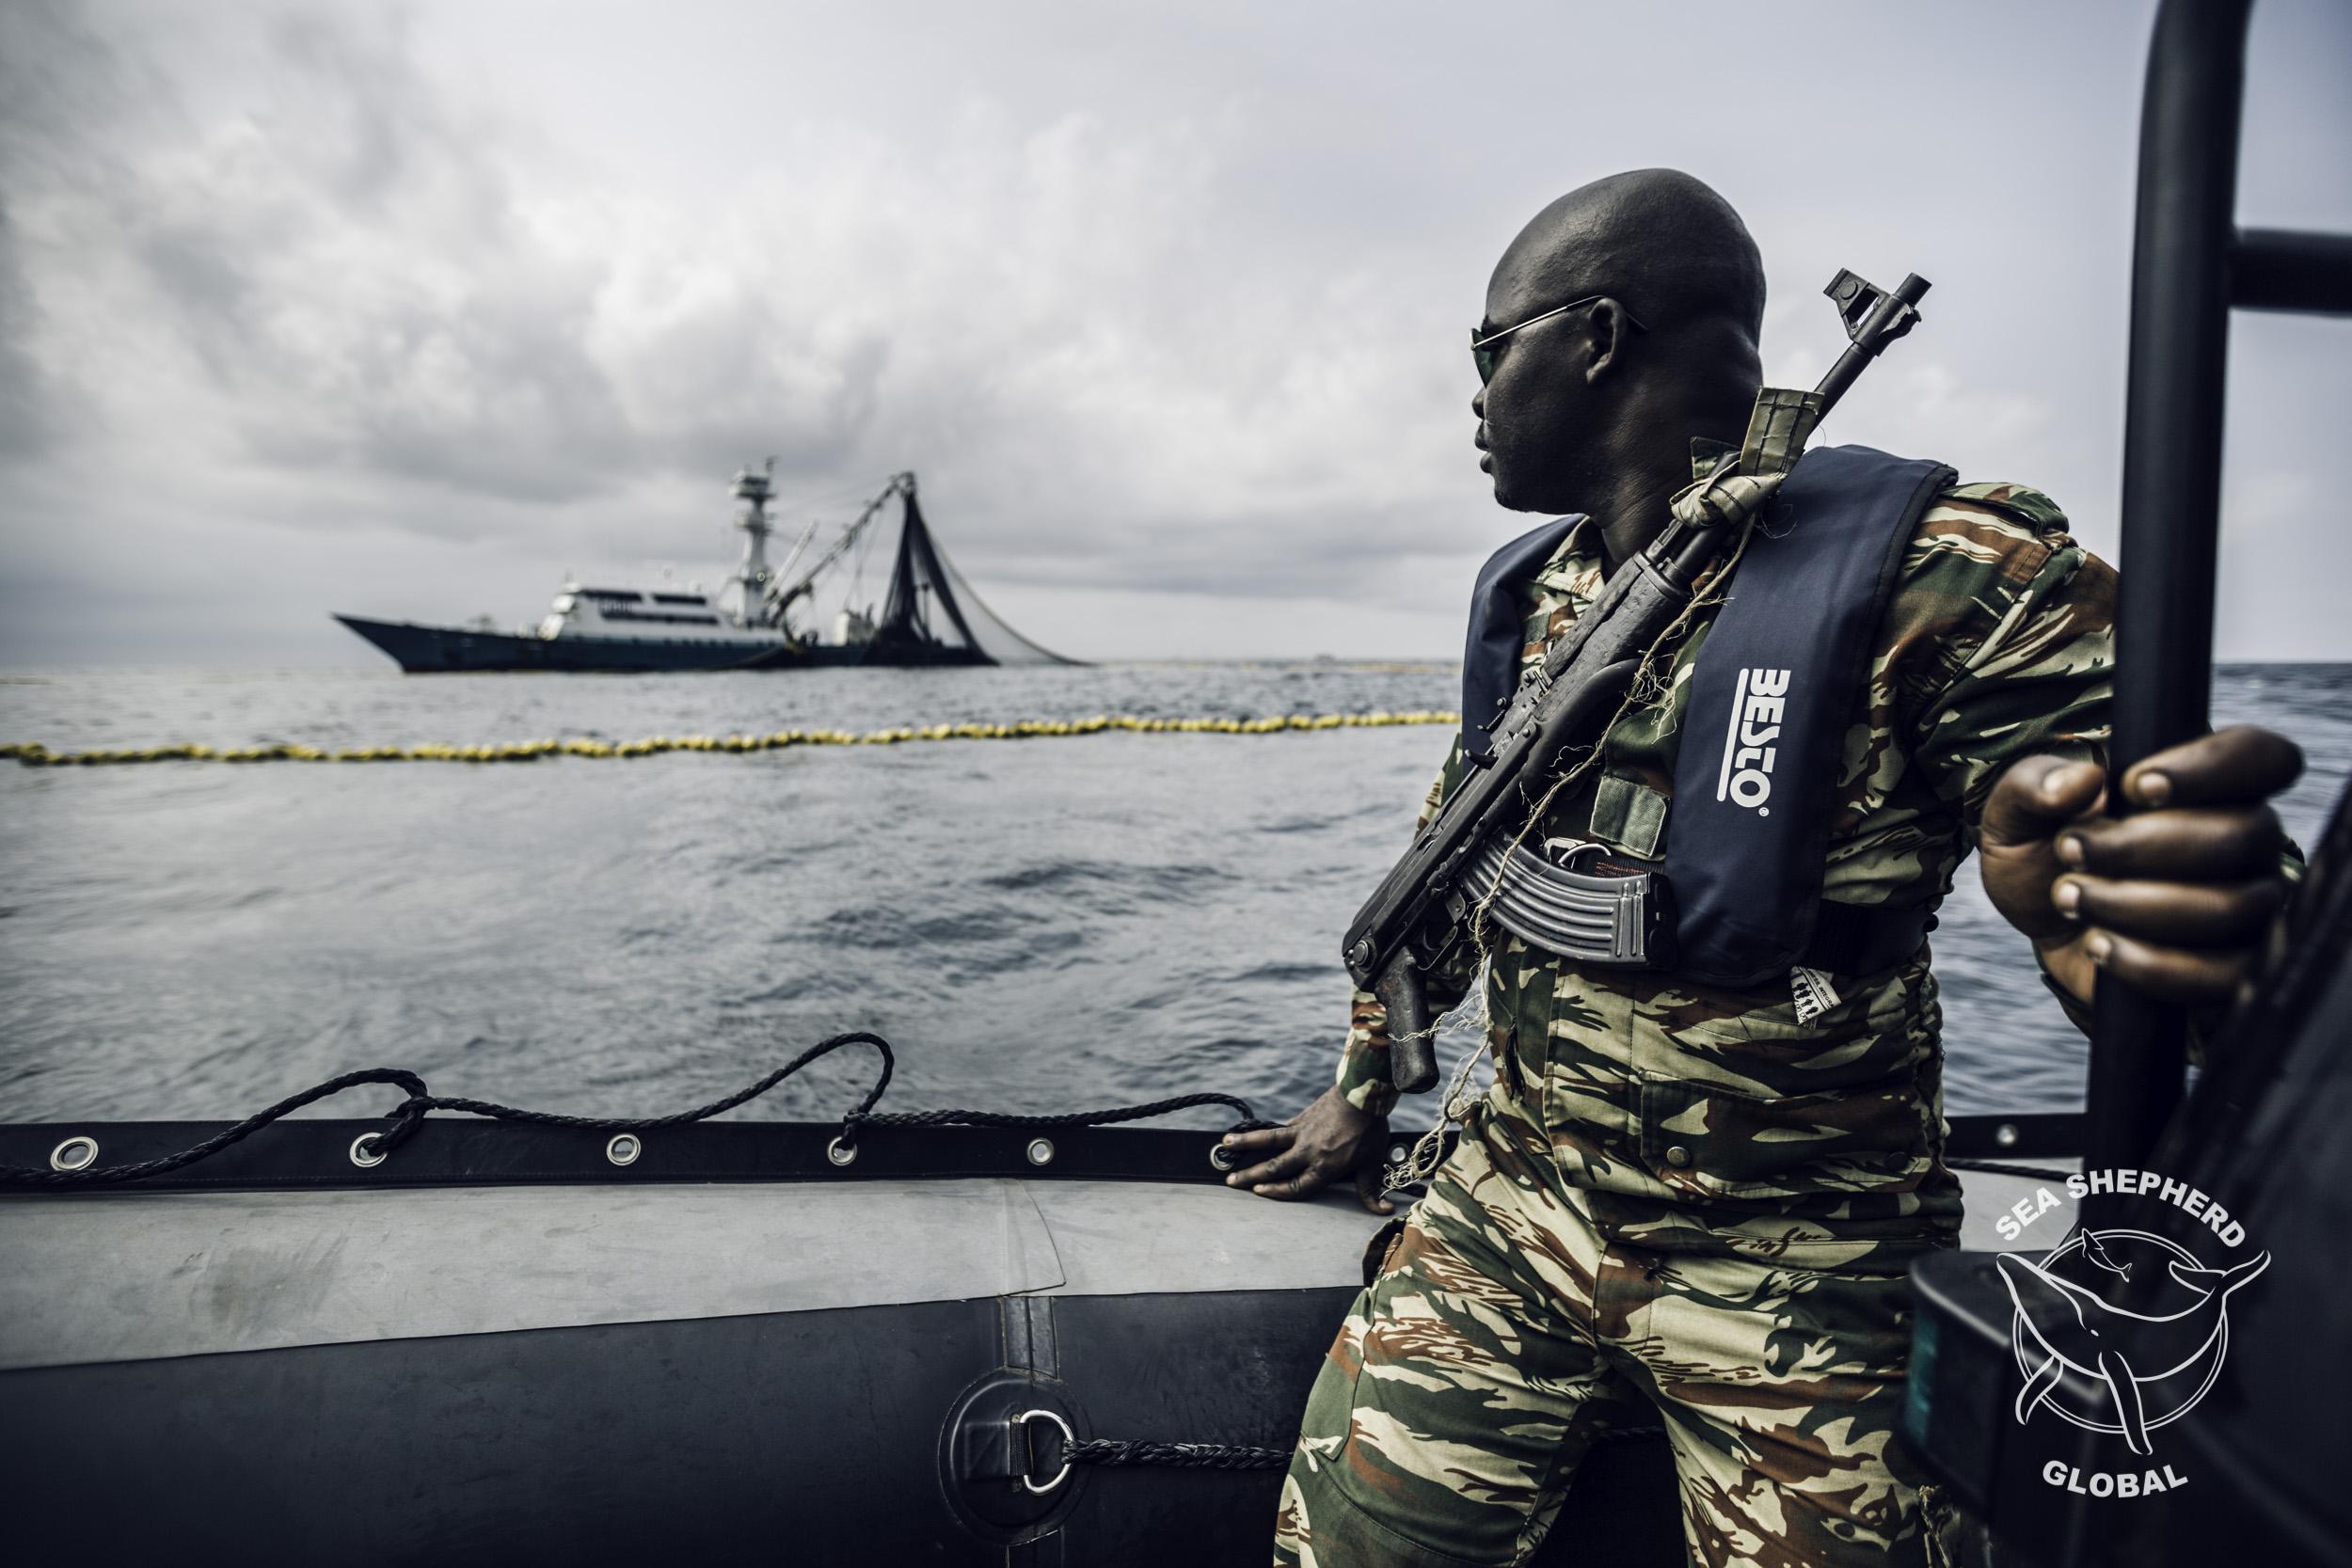 GoKo Travels now partners with Sea Shepard